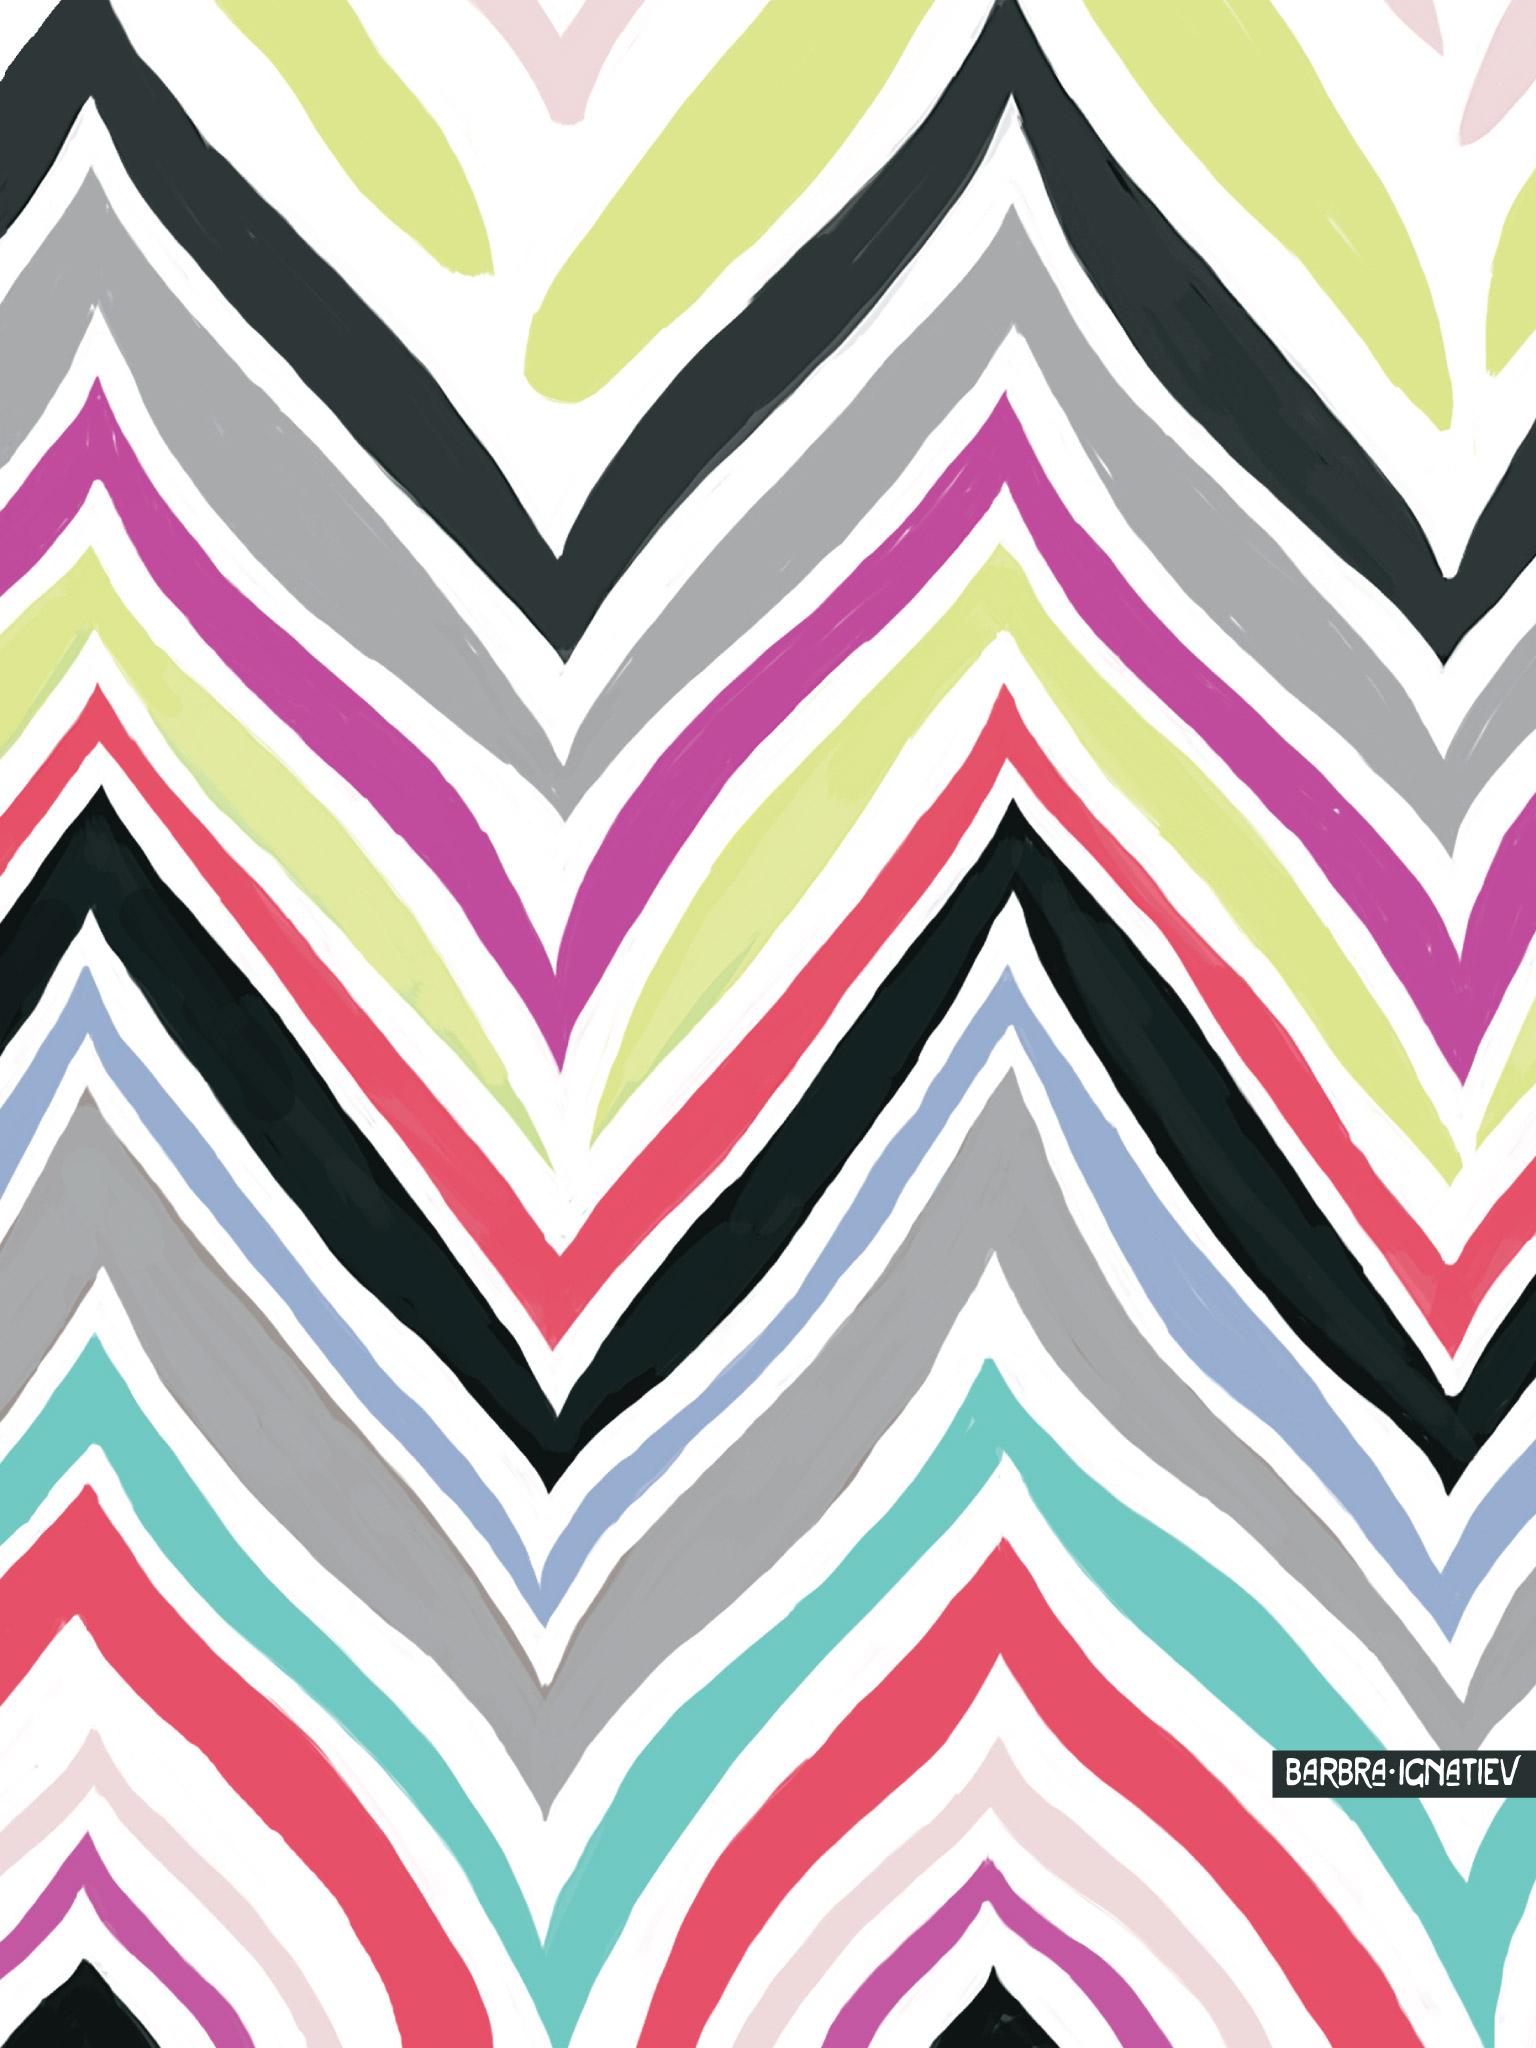 Glitter Chevron Wallpaper - WallpaperSafari